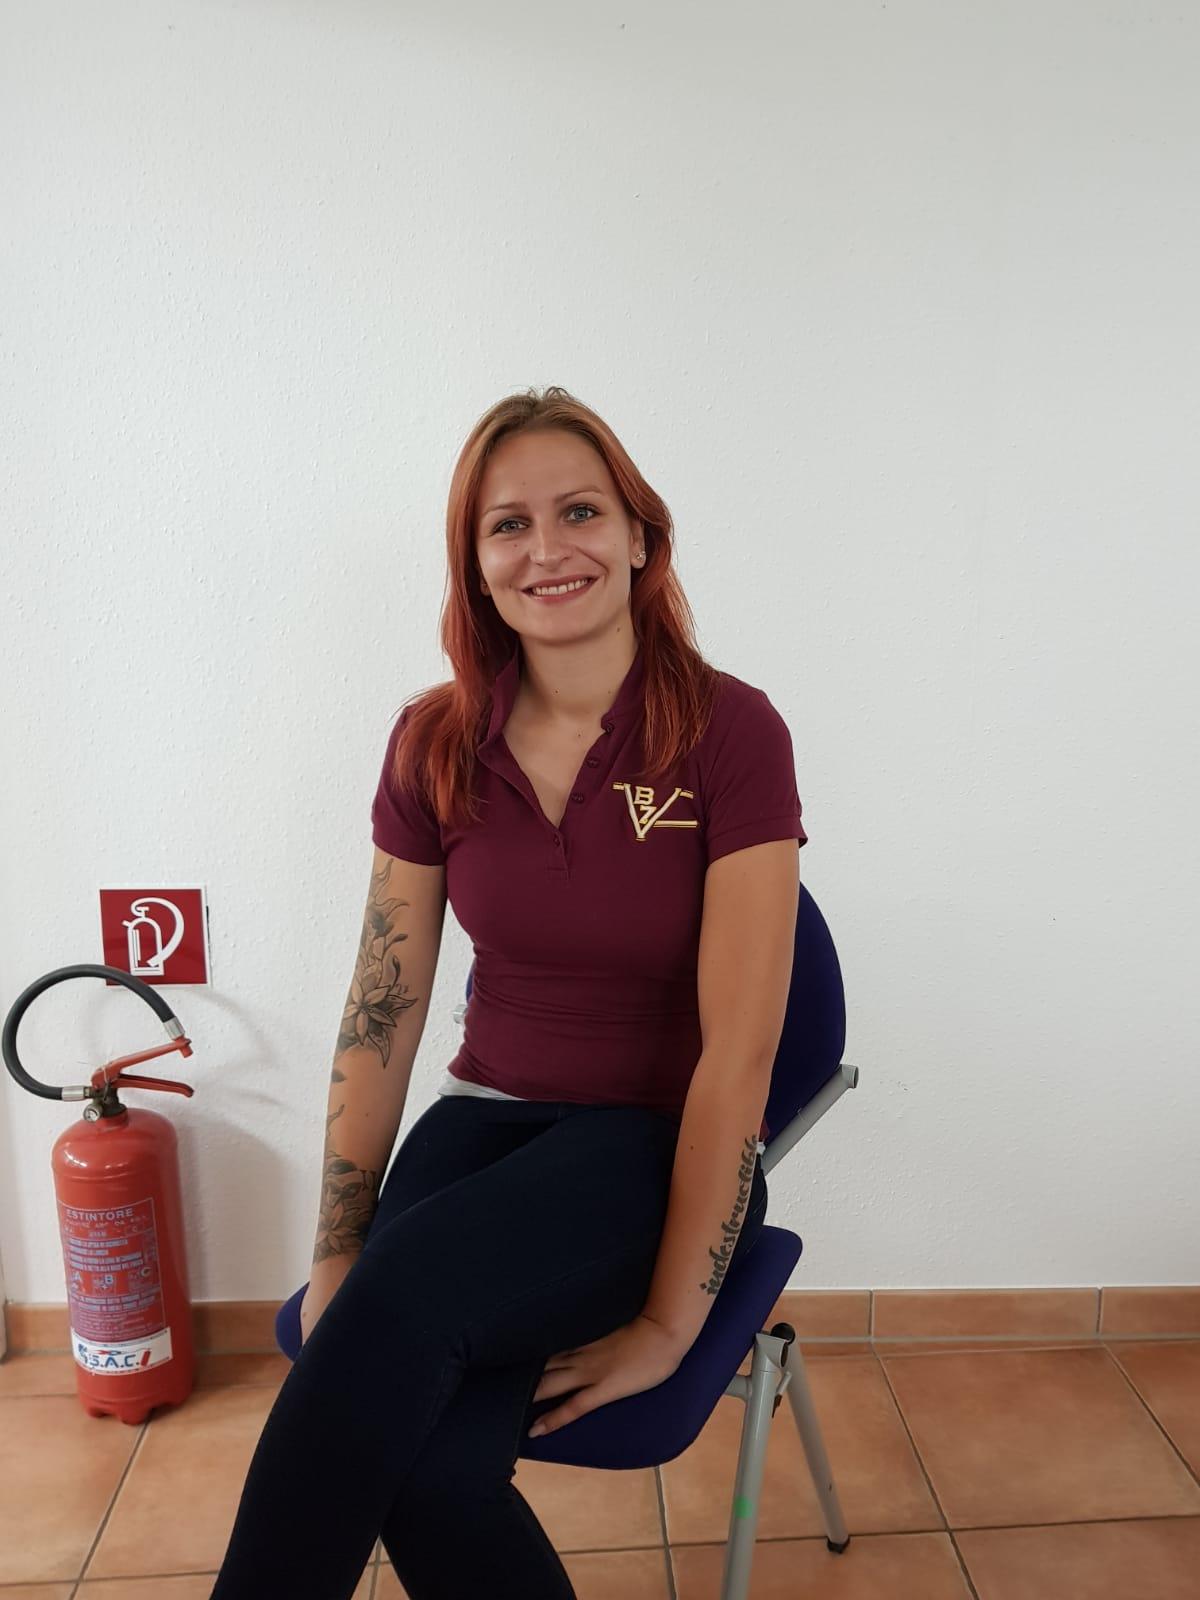 Team VBZ - Alina Heilmeier